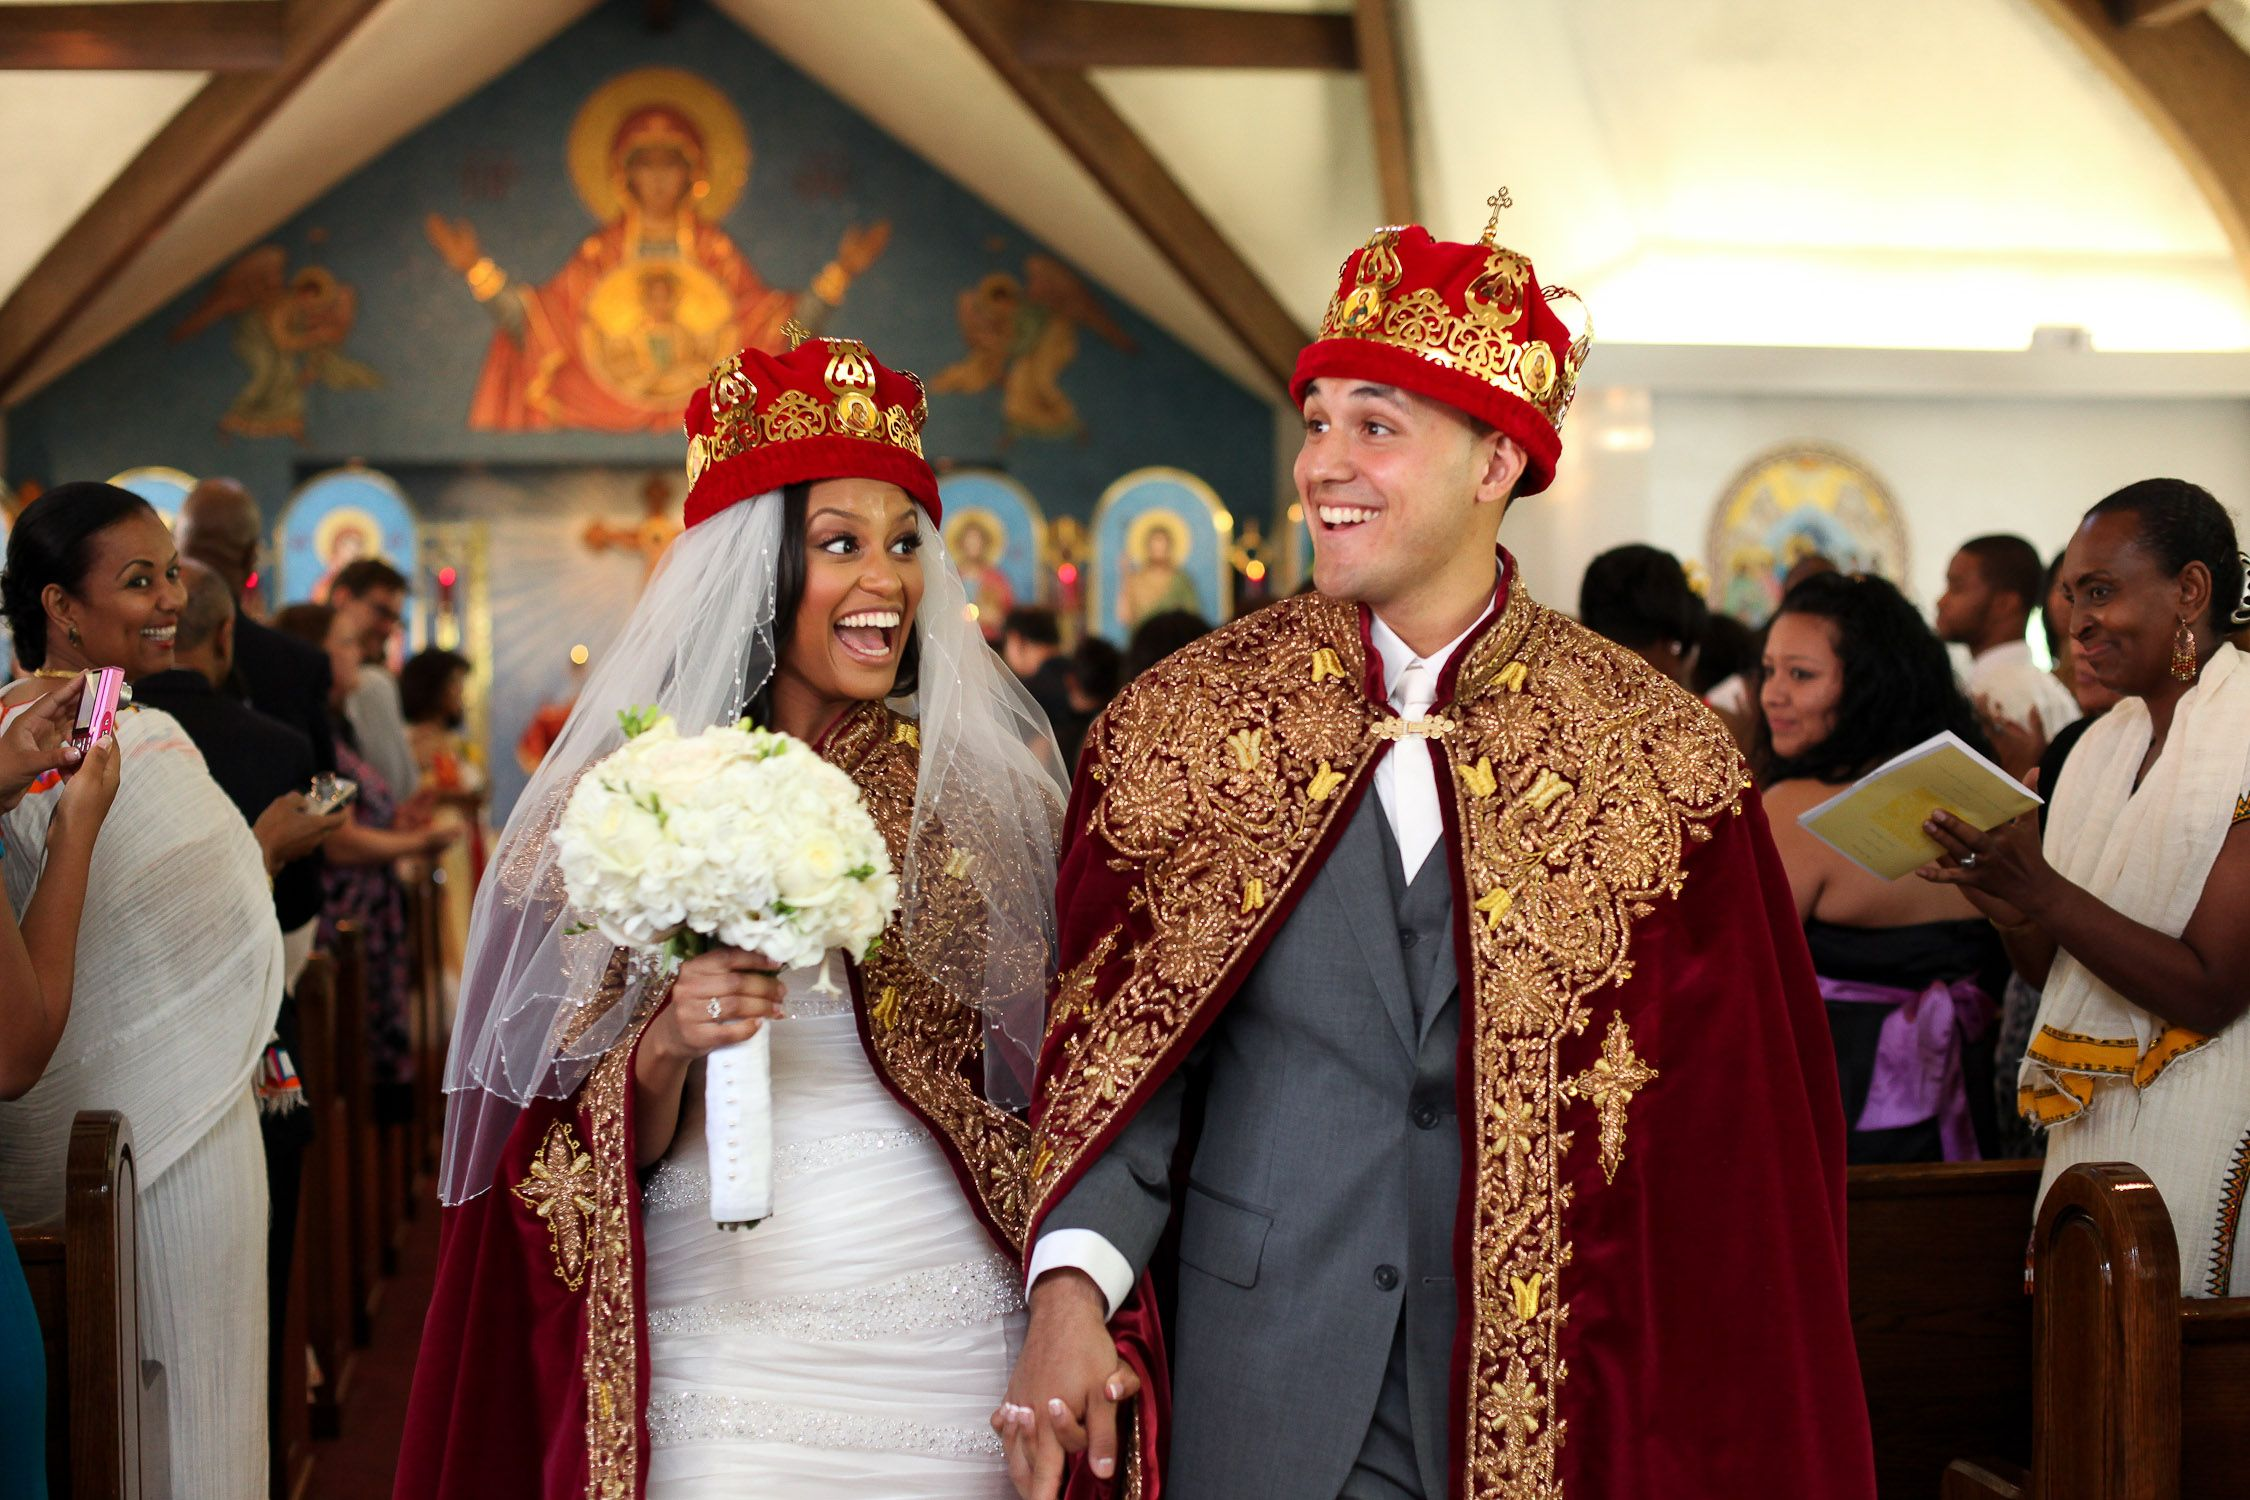 Pin by Love on World Traditional Weddings | Ethiopian wedding